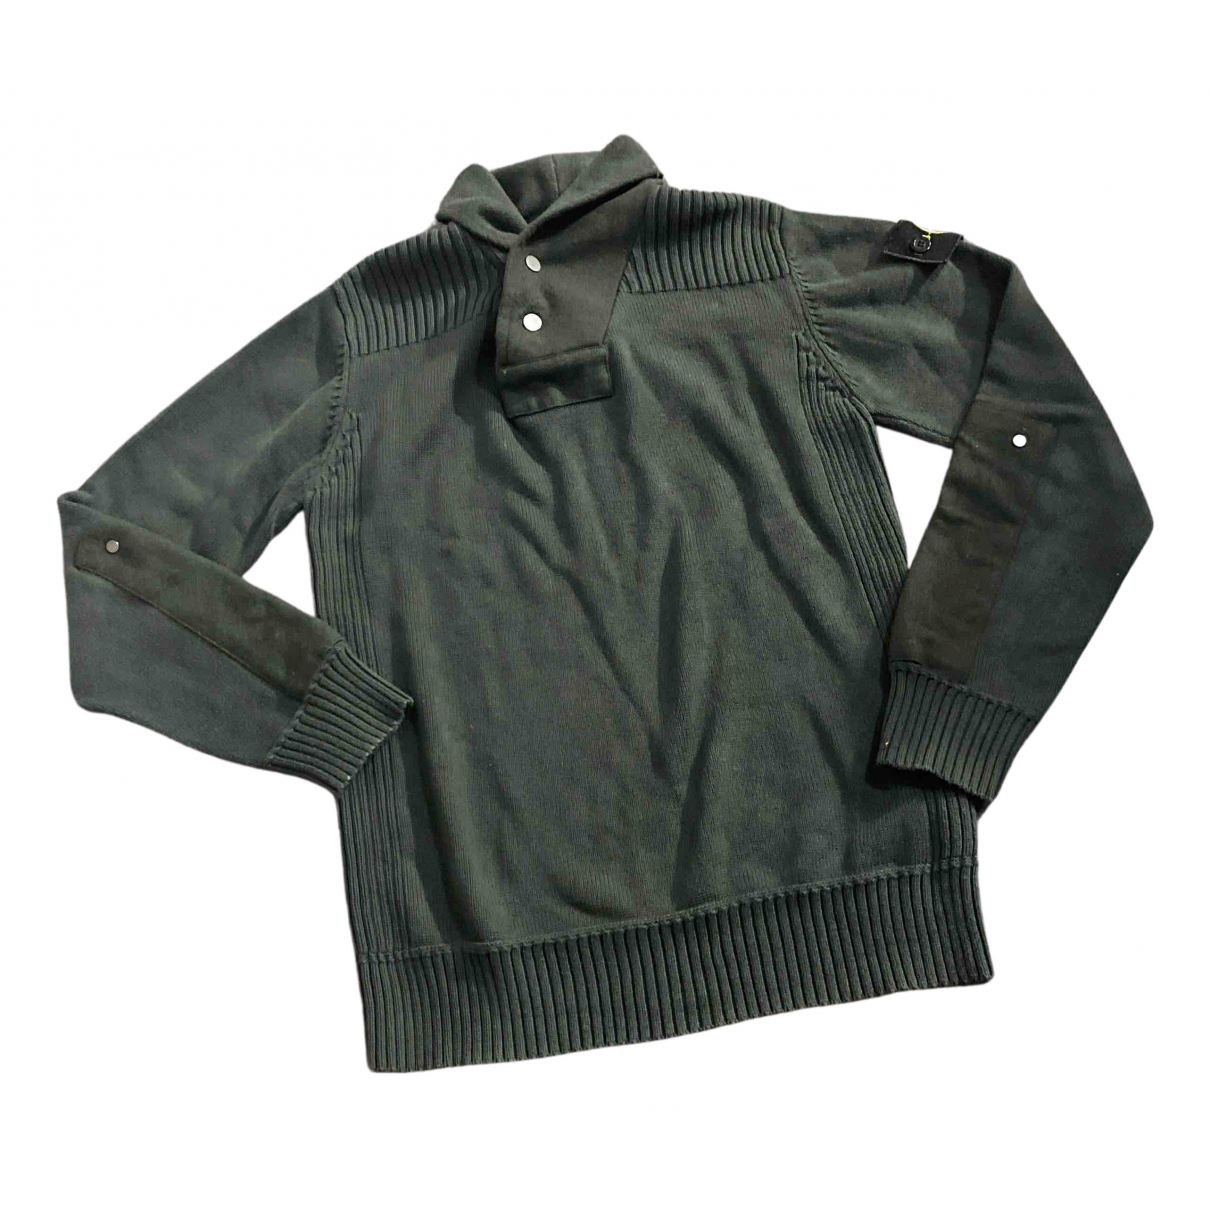 Stone Island N Green Cotton Knitwear & Sweatshirts for Men M International